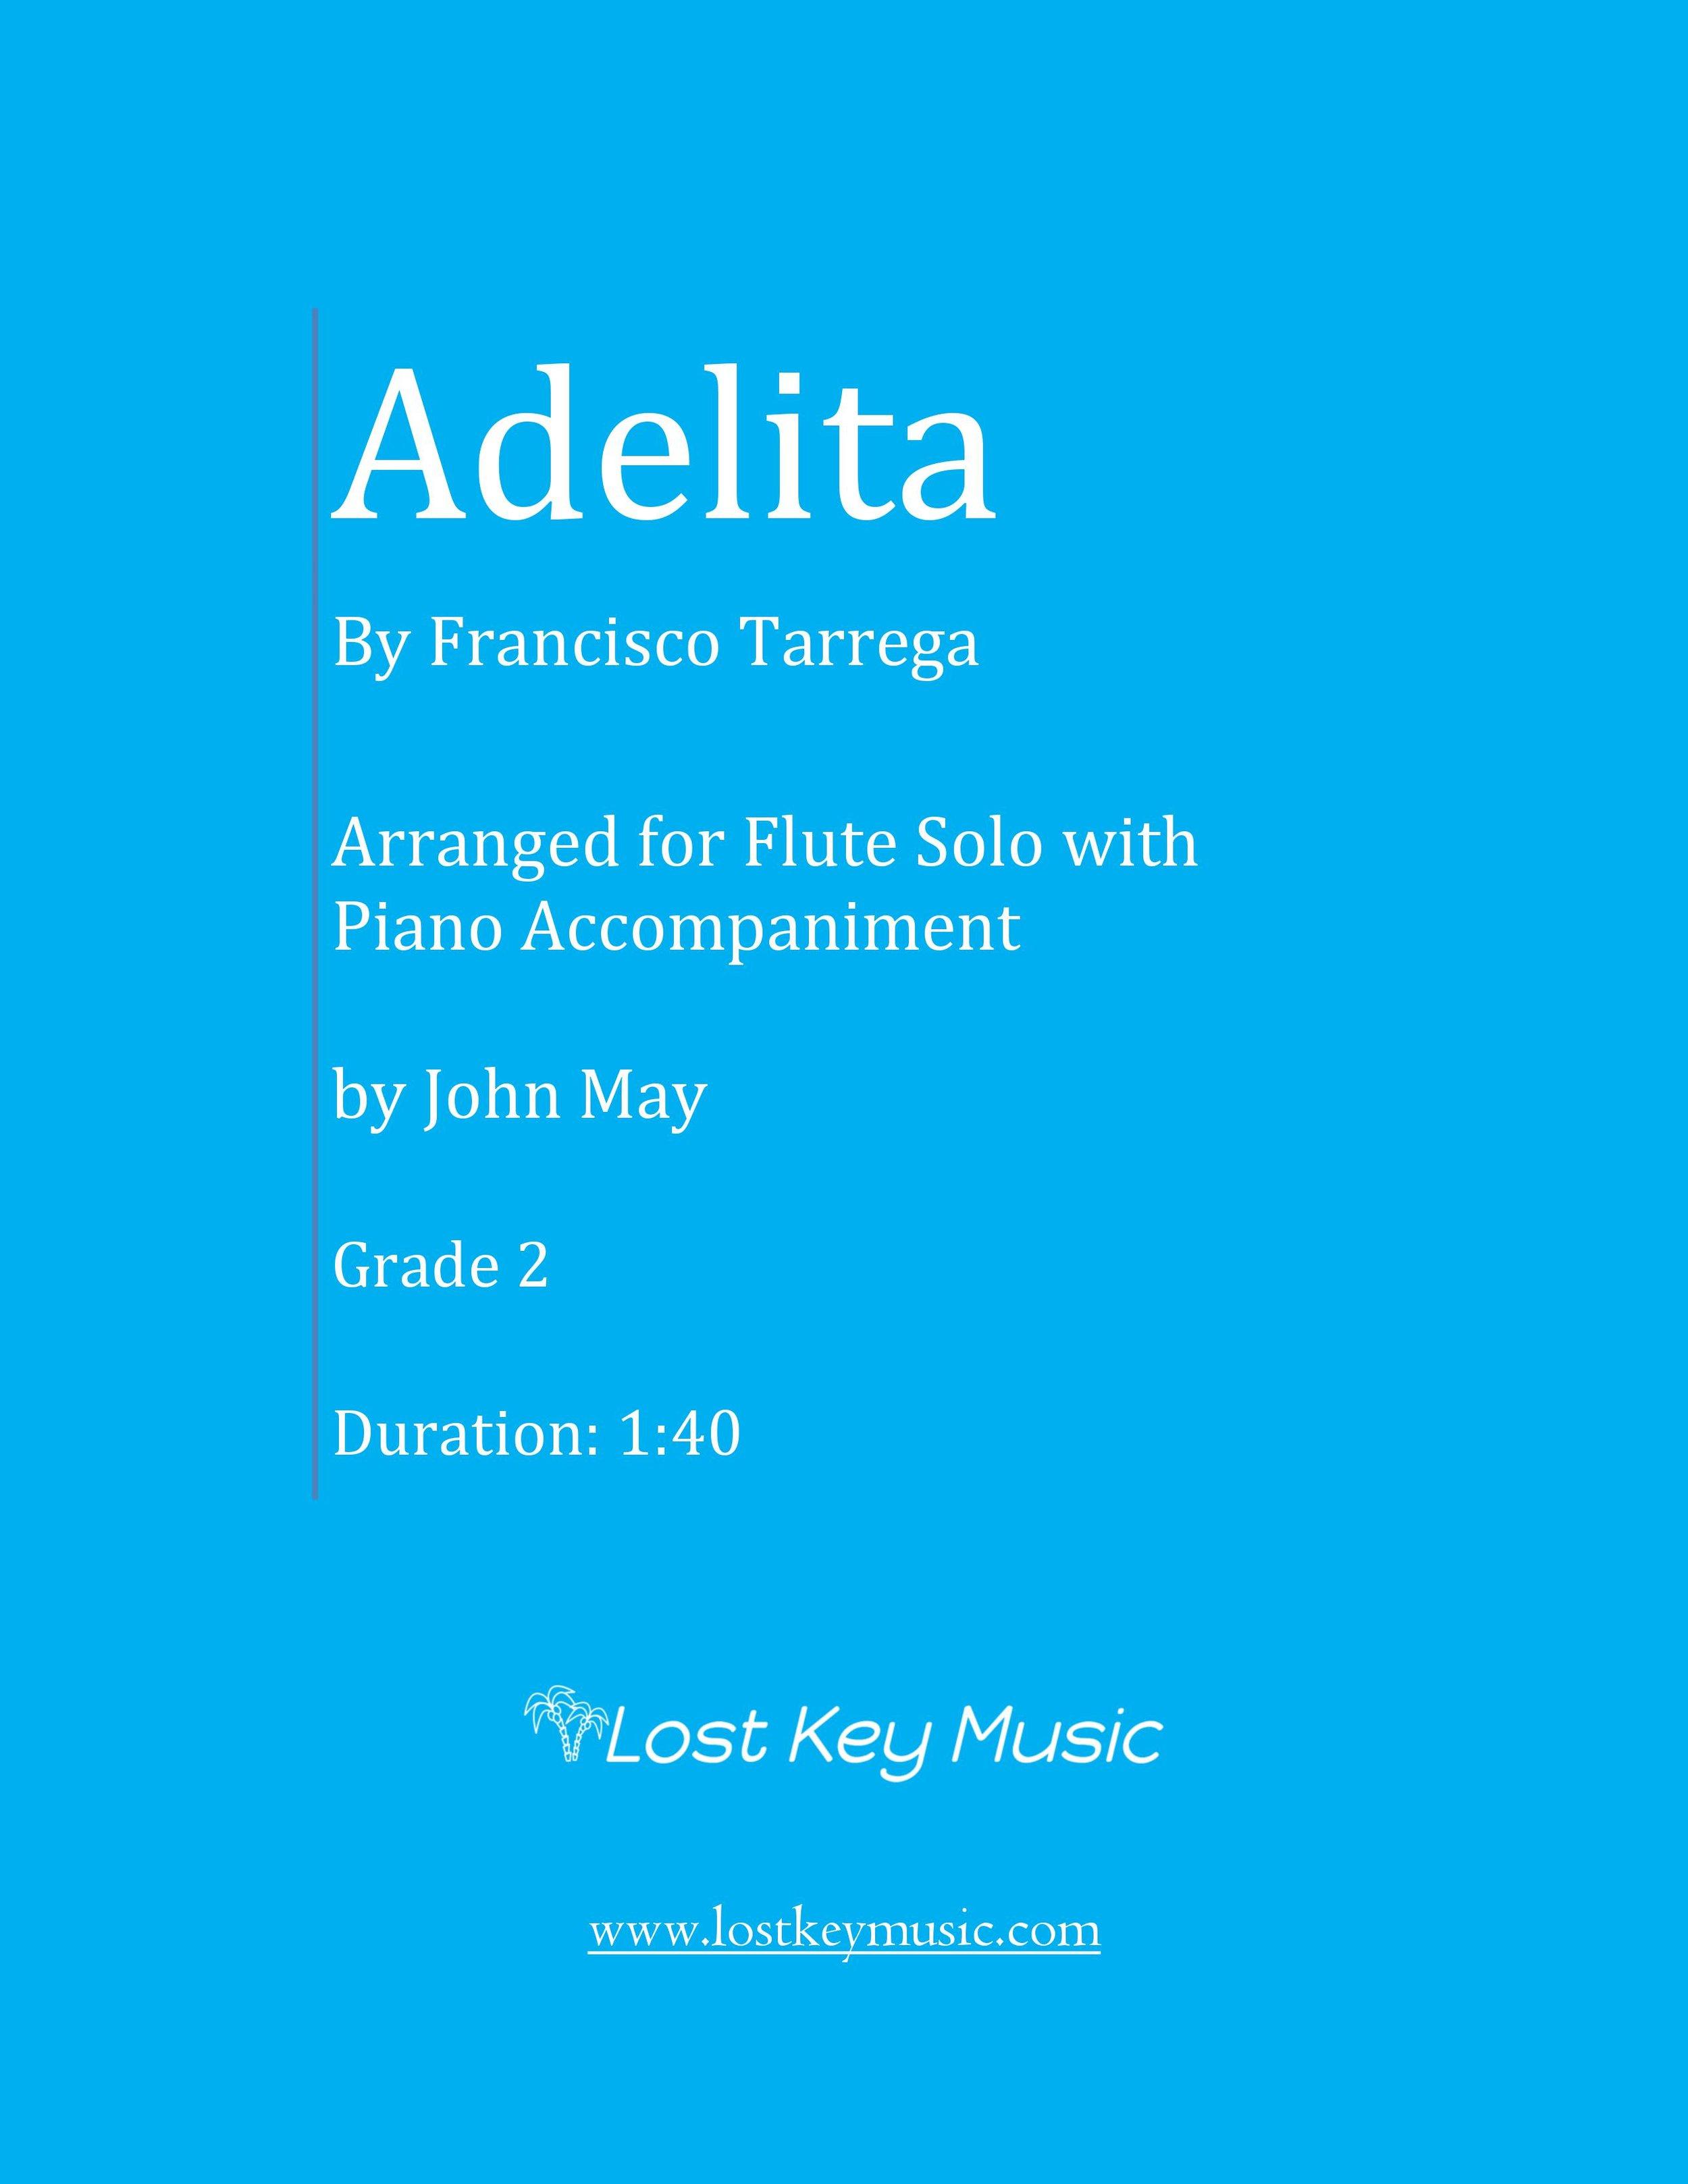 Adelita-Flute Solo with Piano Accompaniment.jpg